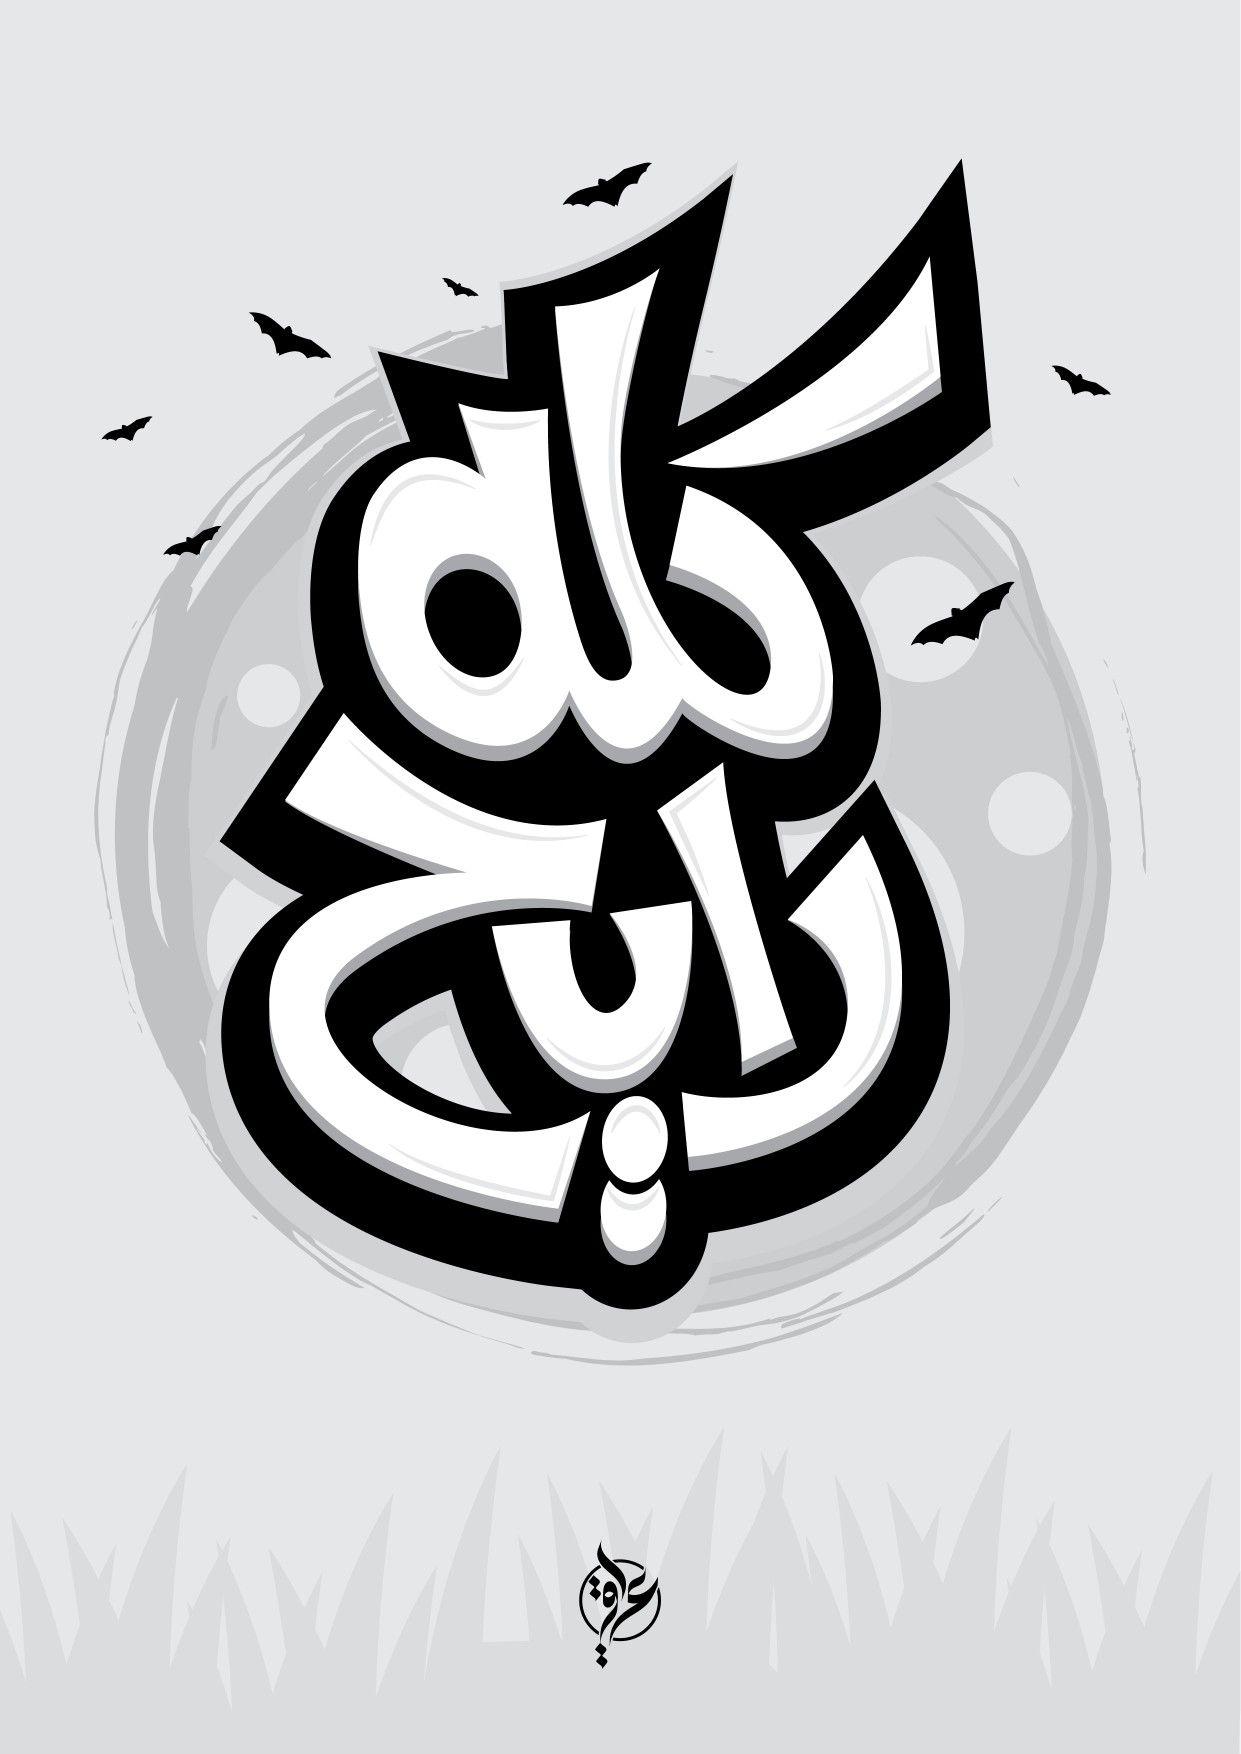 كله رايح تايبوجرافي Ahmed Eraky Calligraphy Art Quotes Word Drawings Arabic Calligraphy Design